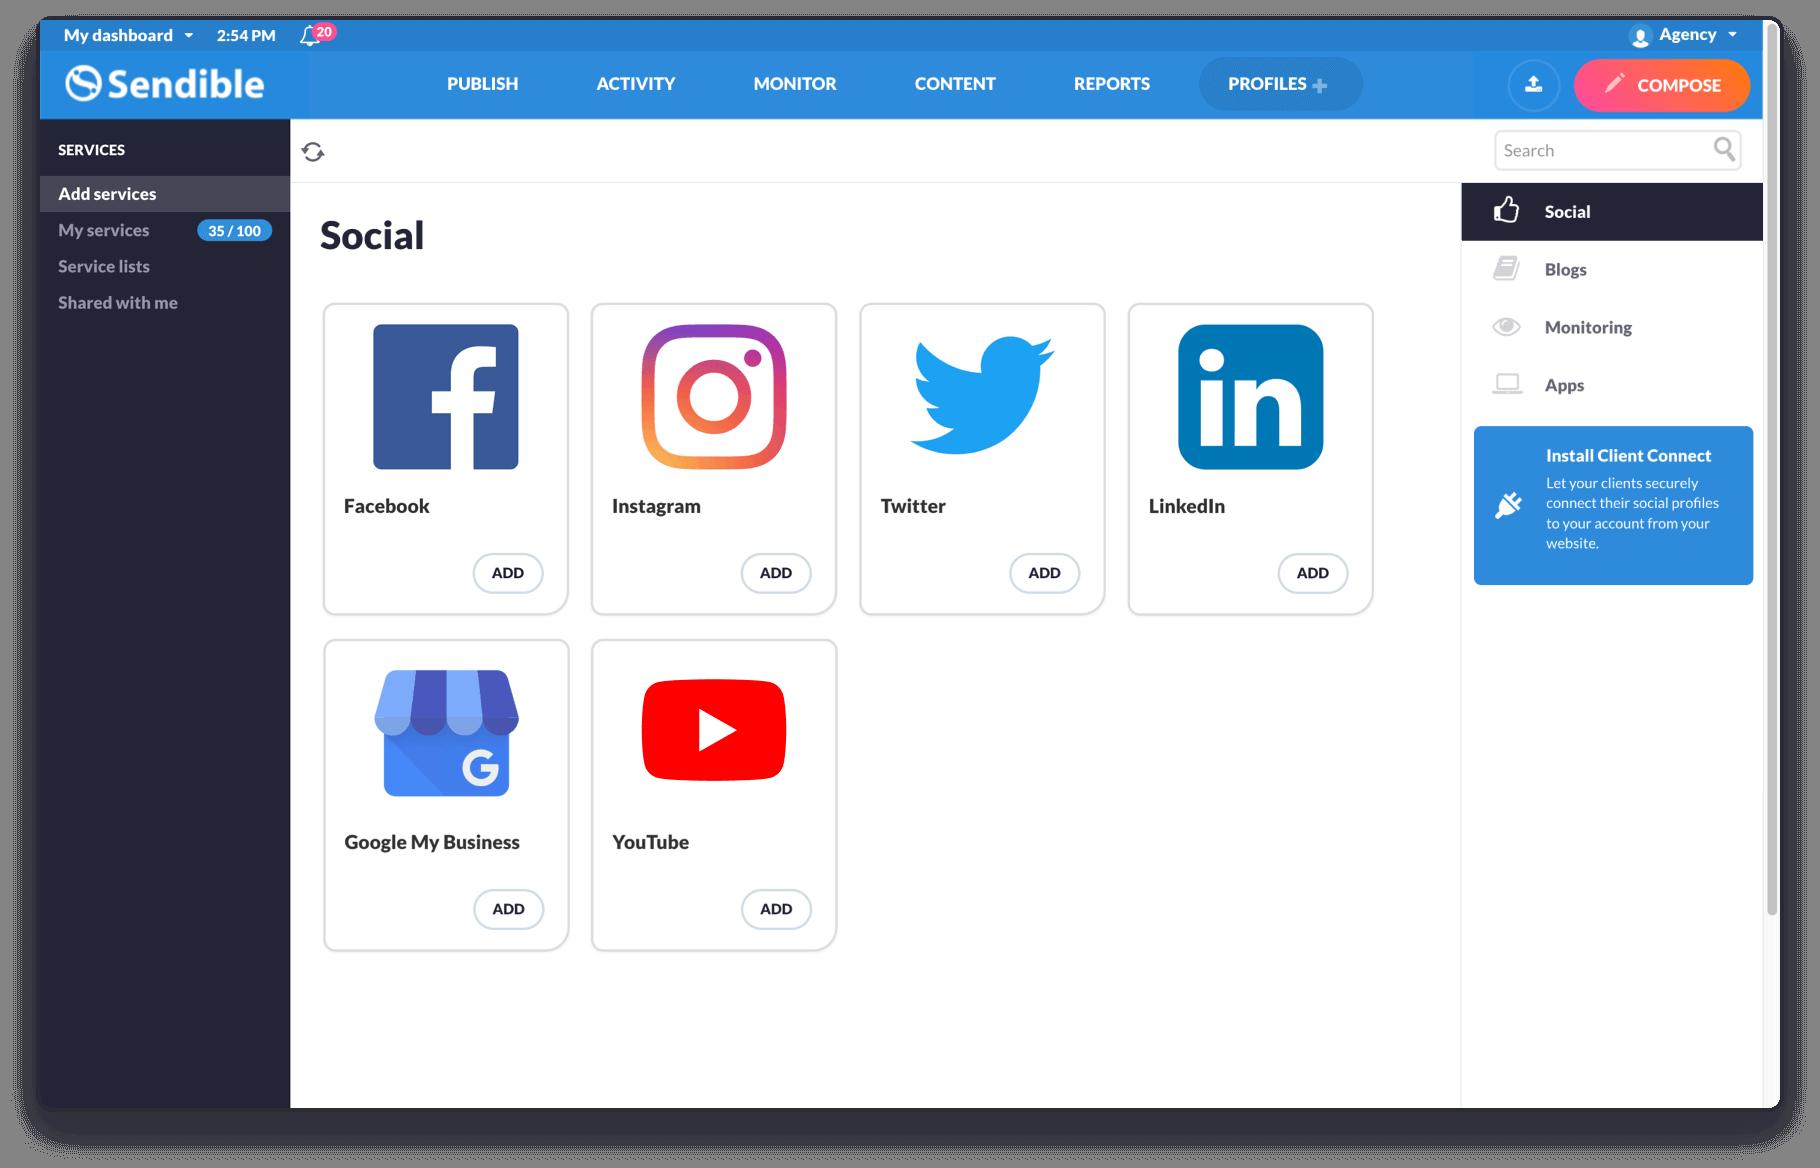 In-depth publishing to Facebook, Twitter, LinkedIn & Google+